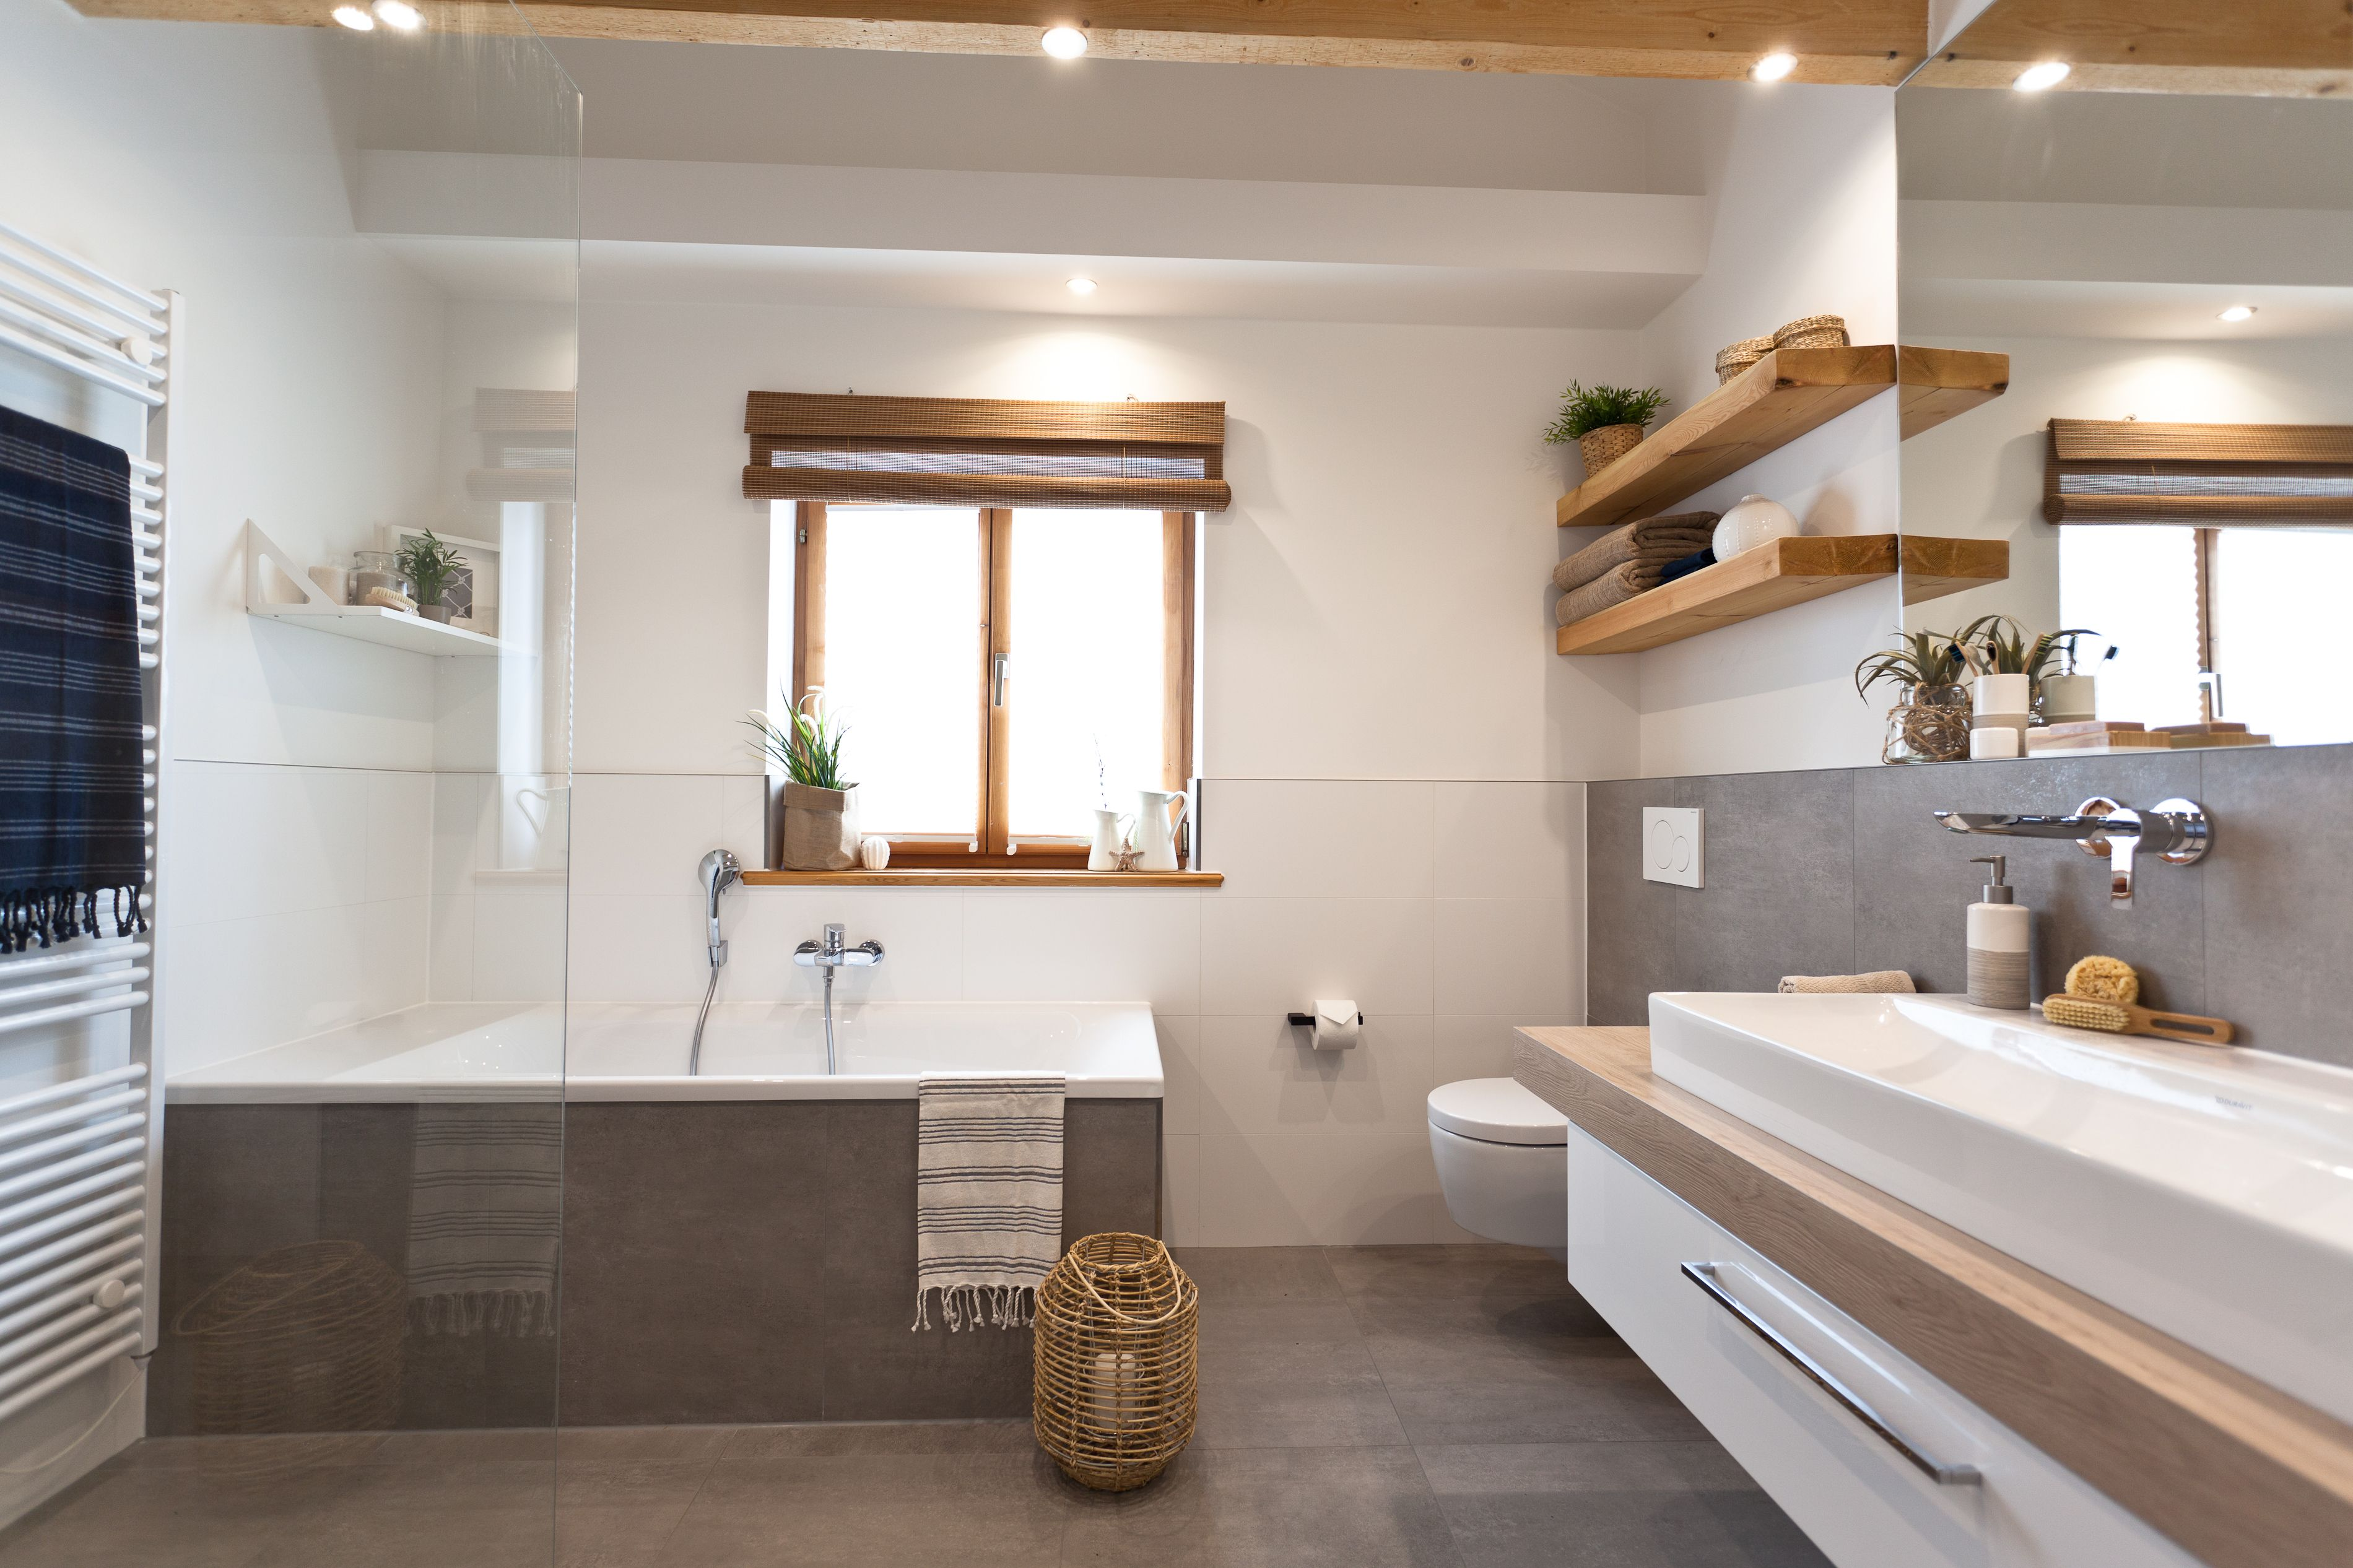 Badezimmer richtig dekorieren | Fliesen betonoptik ...